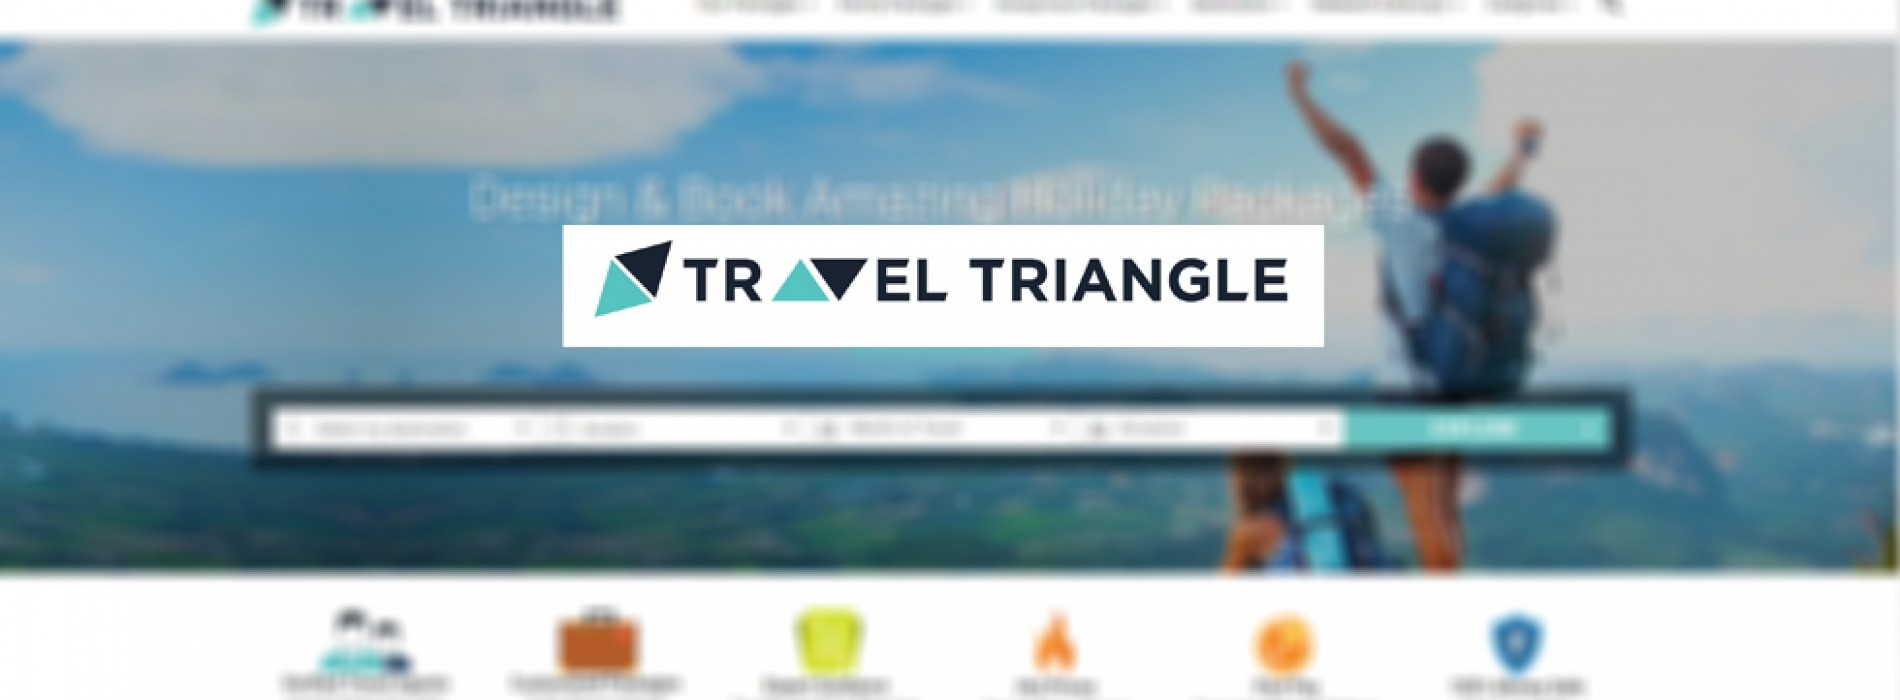 TravelTriangle raises $10 million in fresh round of funding